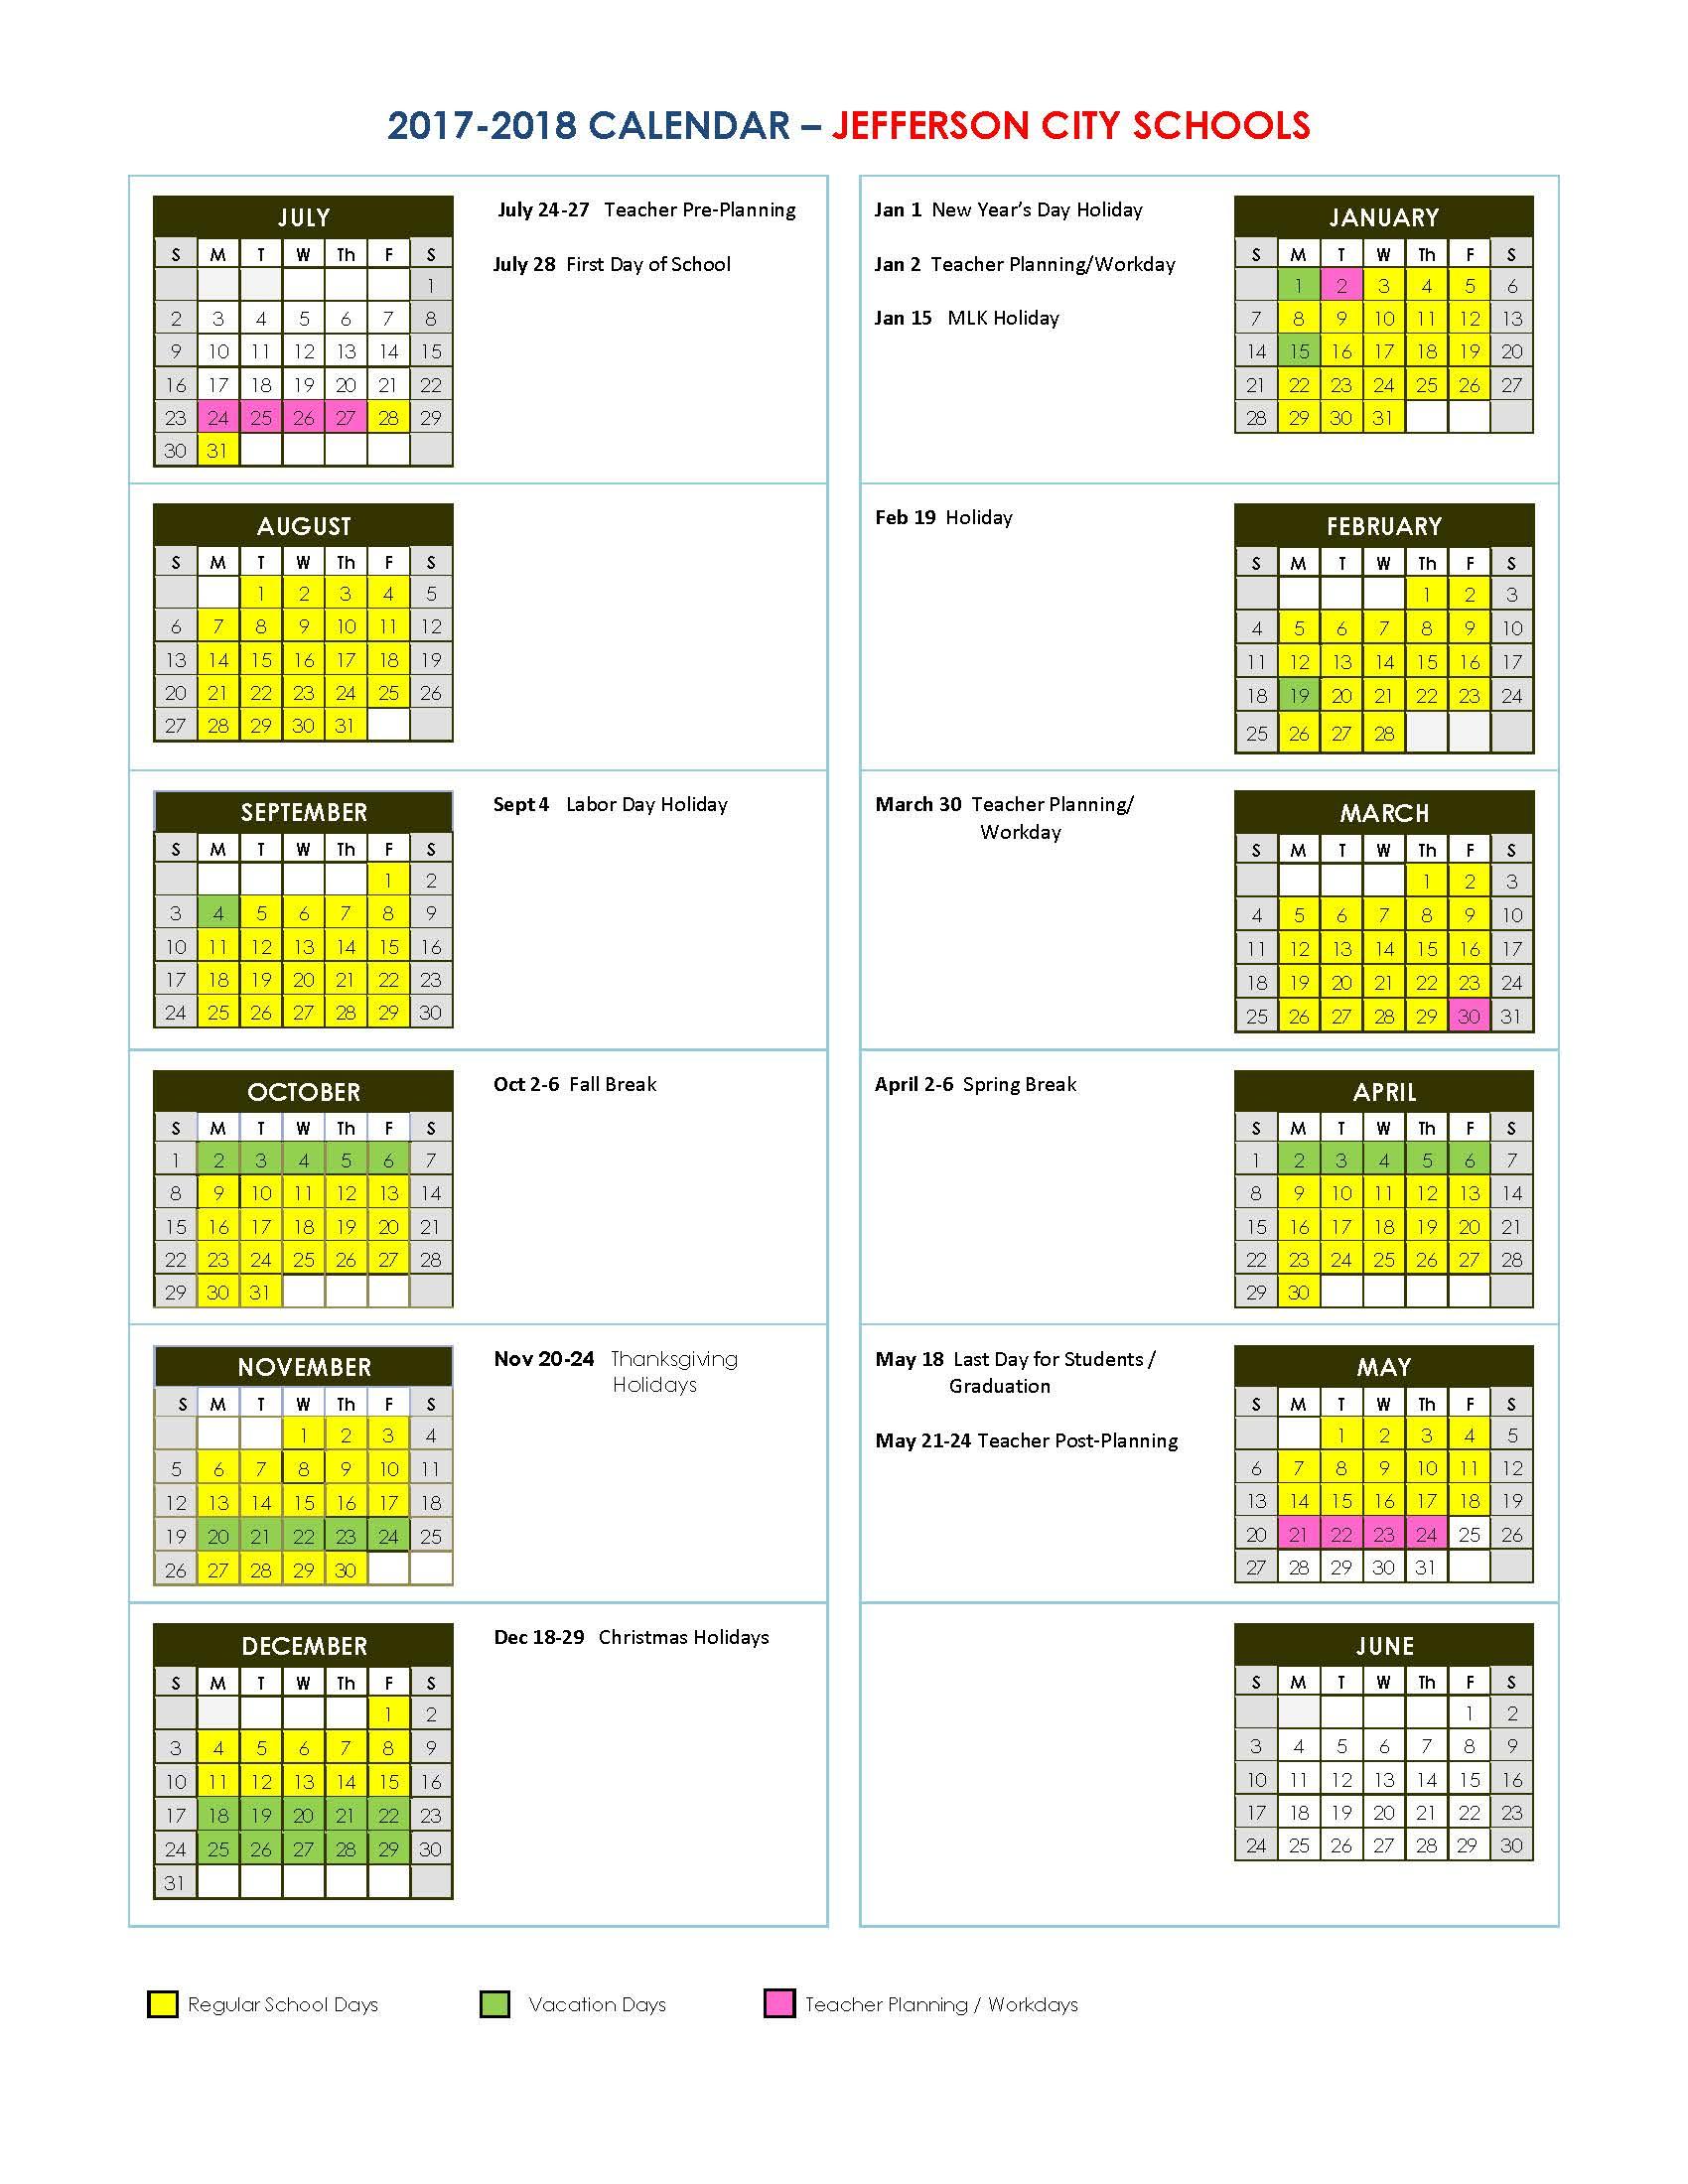 Jefferson City Schools Throughout Metro Nashville School Calendar 2021 20